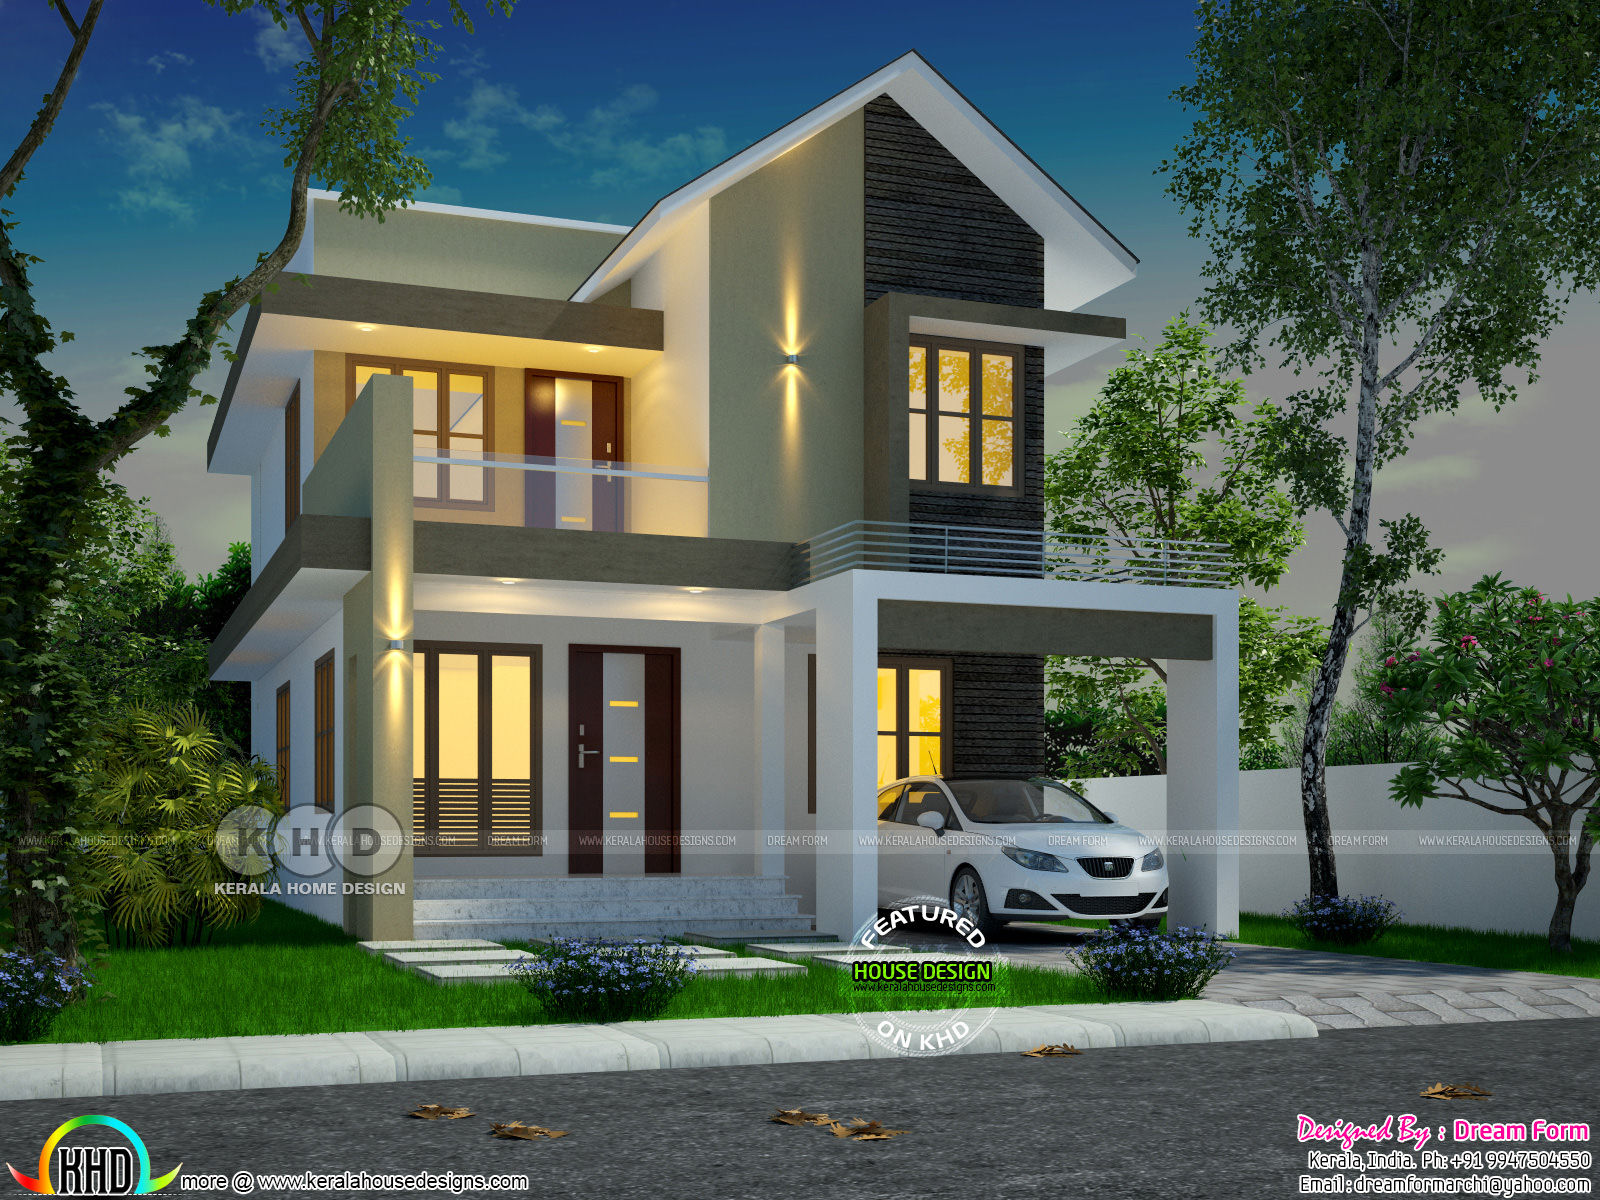 House design of kerala - Beautiful Budget Friendly Kerala Home Design